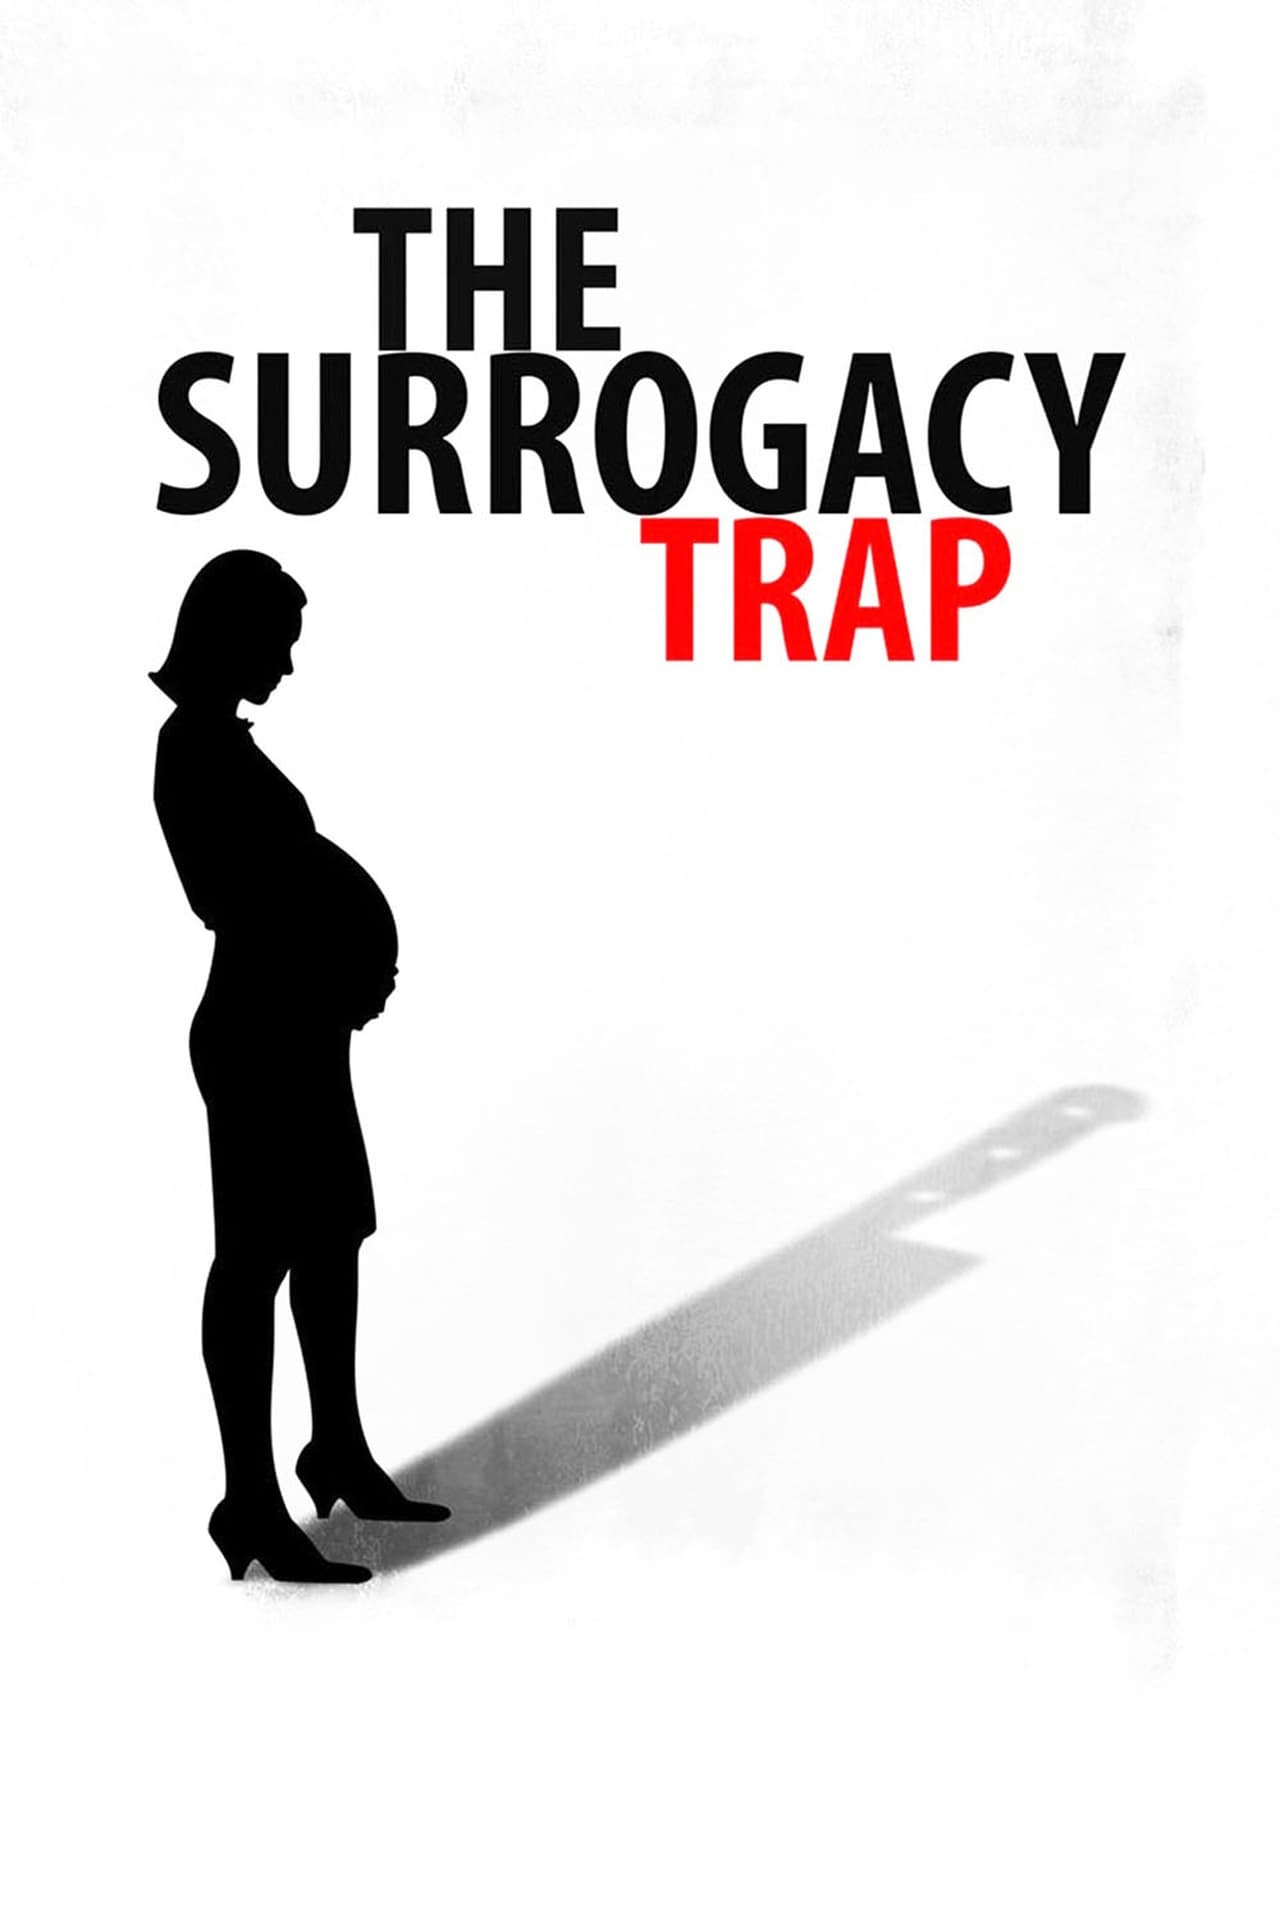 The Surrogacy Trap (2013)